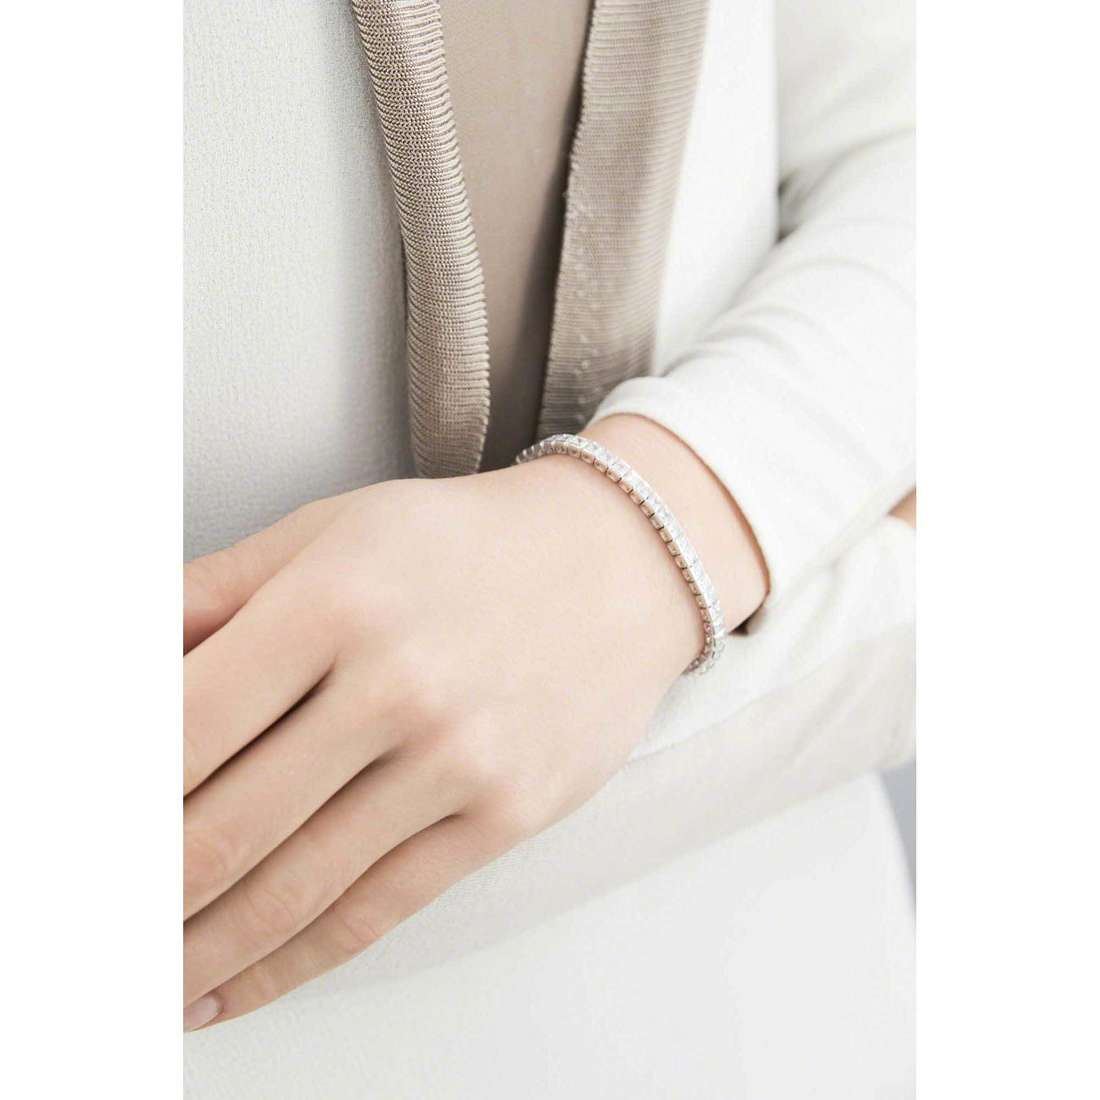 GioiaPura bracciali donna 8568-01-16 indosso